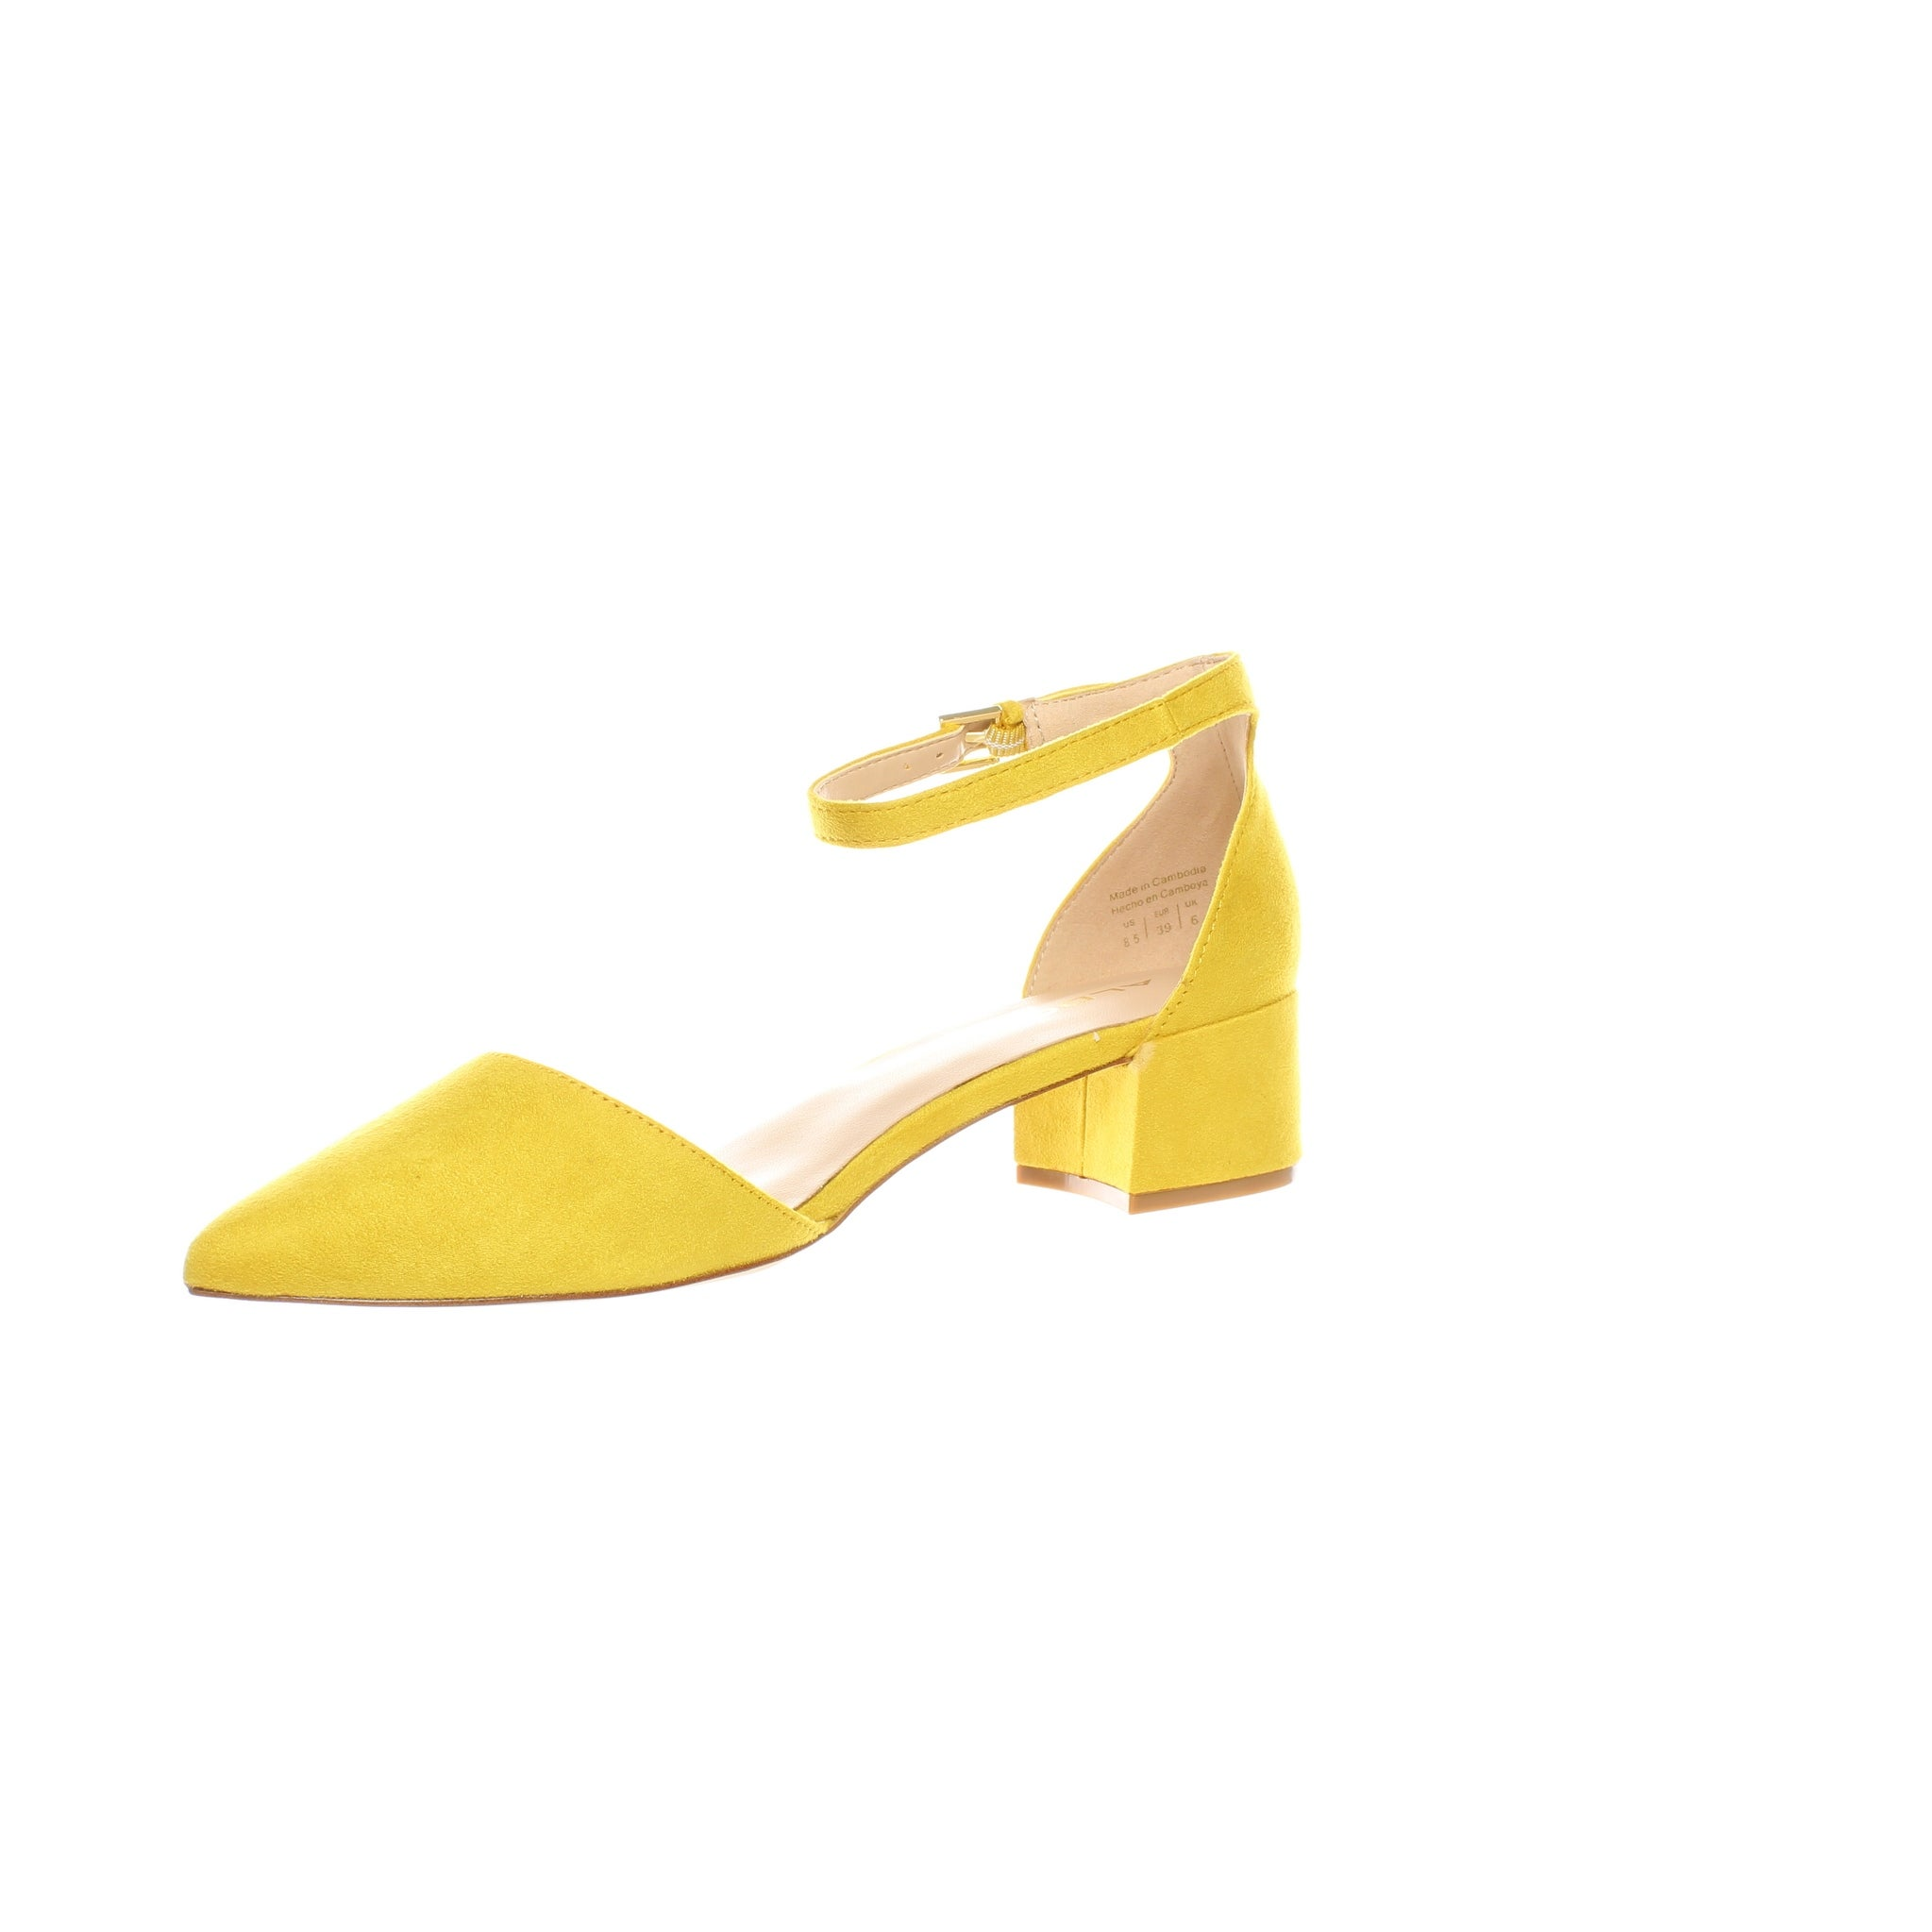 131d99f6e Shop ALDO Womens Zulian Mustard Ankle Strap Heels Size 8.5 - On Sale - Free  Shipping On Orders Over $45 - Overstock - 28113972